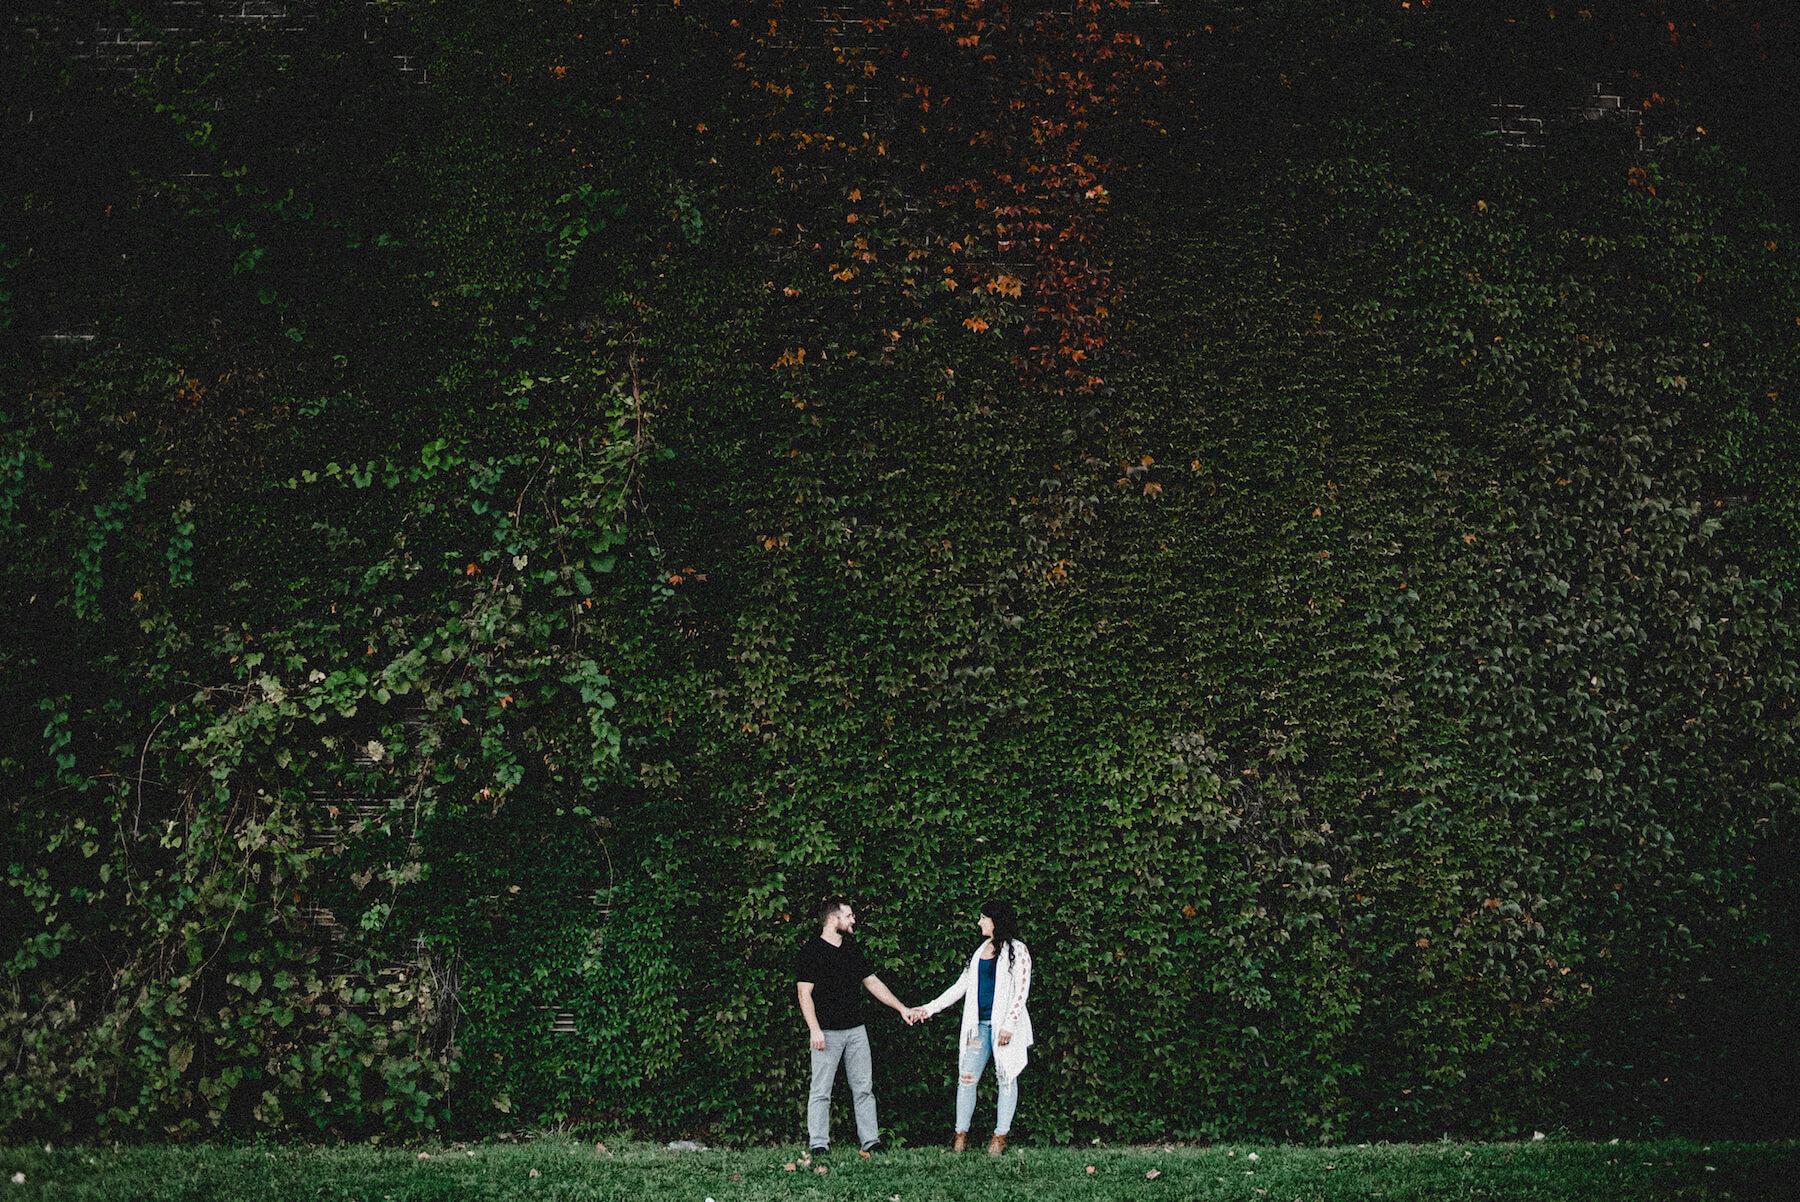 Engle-Olson-Chad-Jen-Engagement-28.jpg